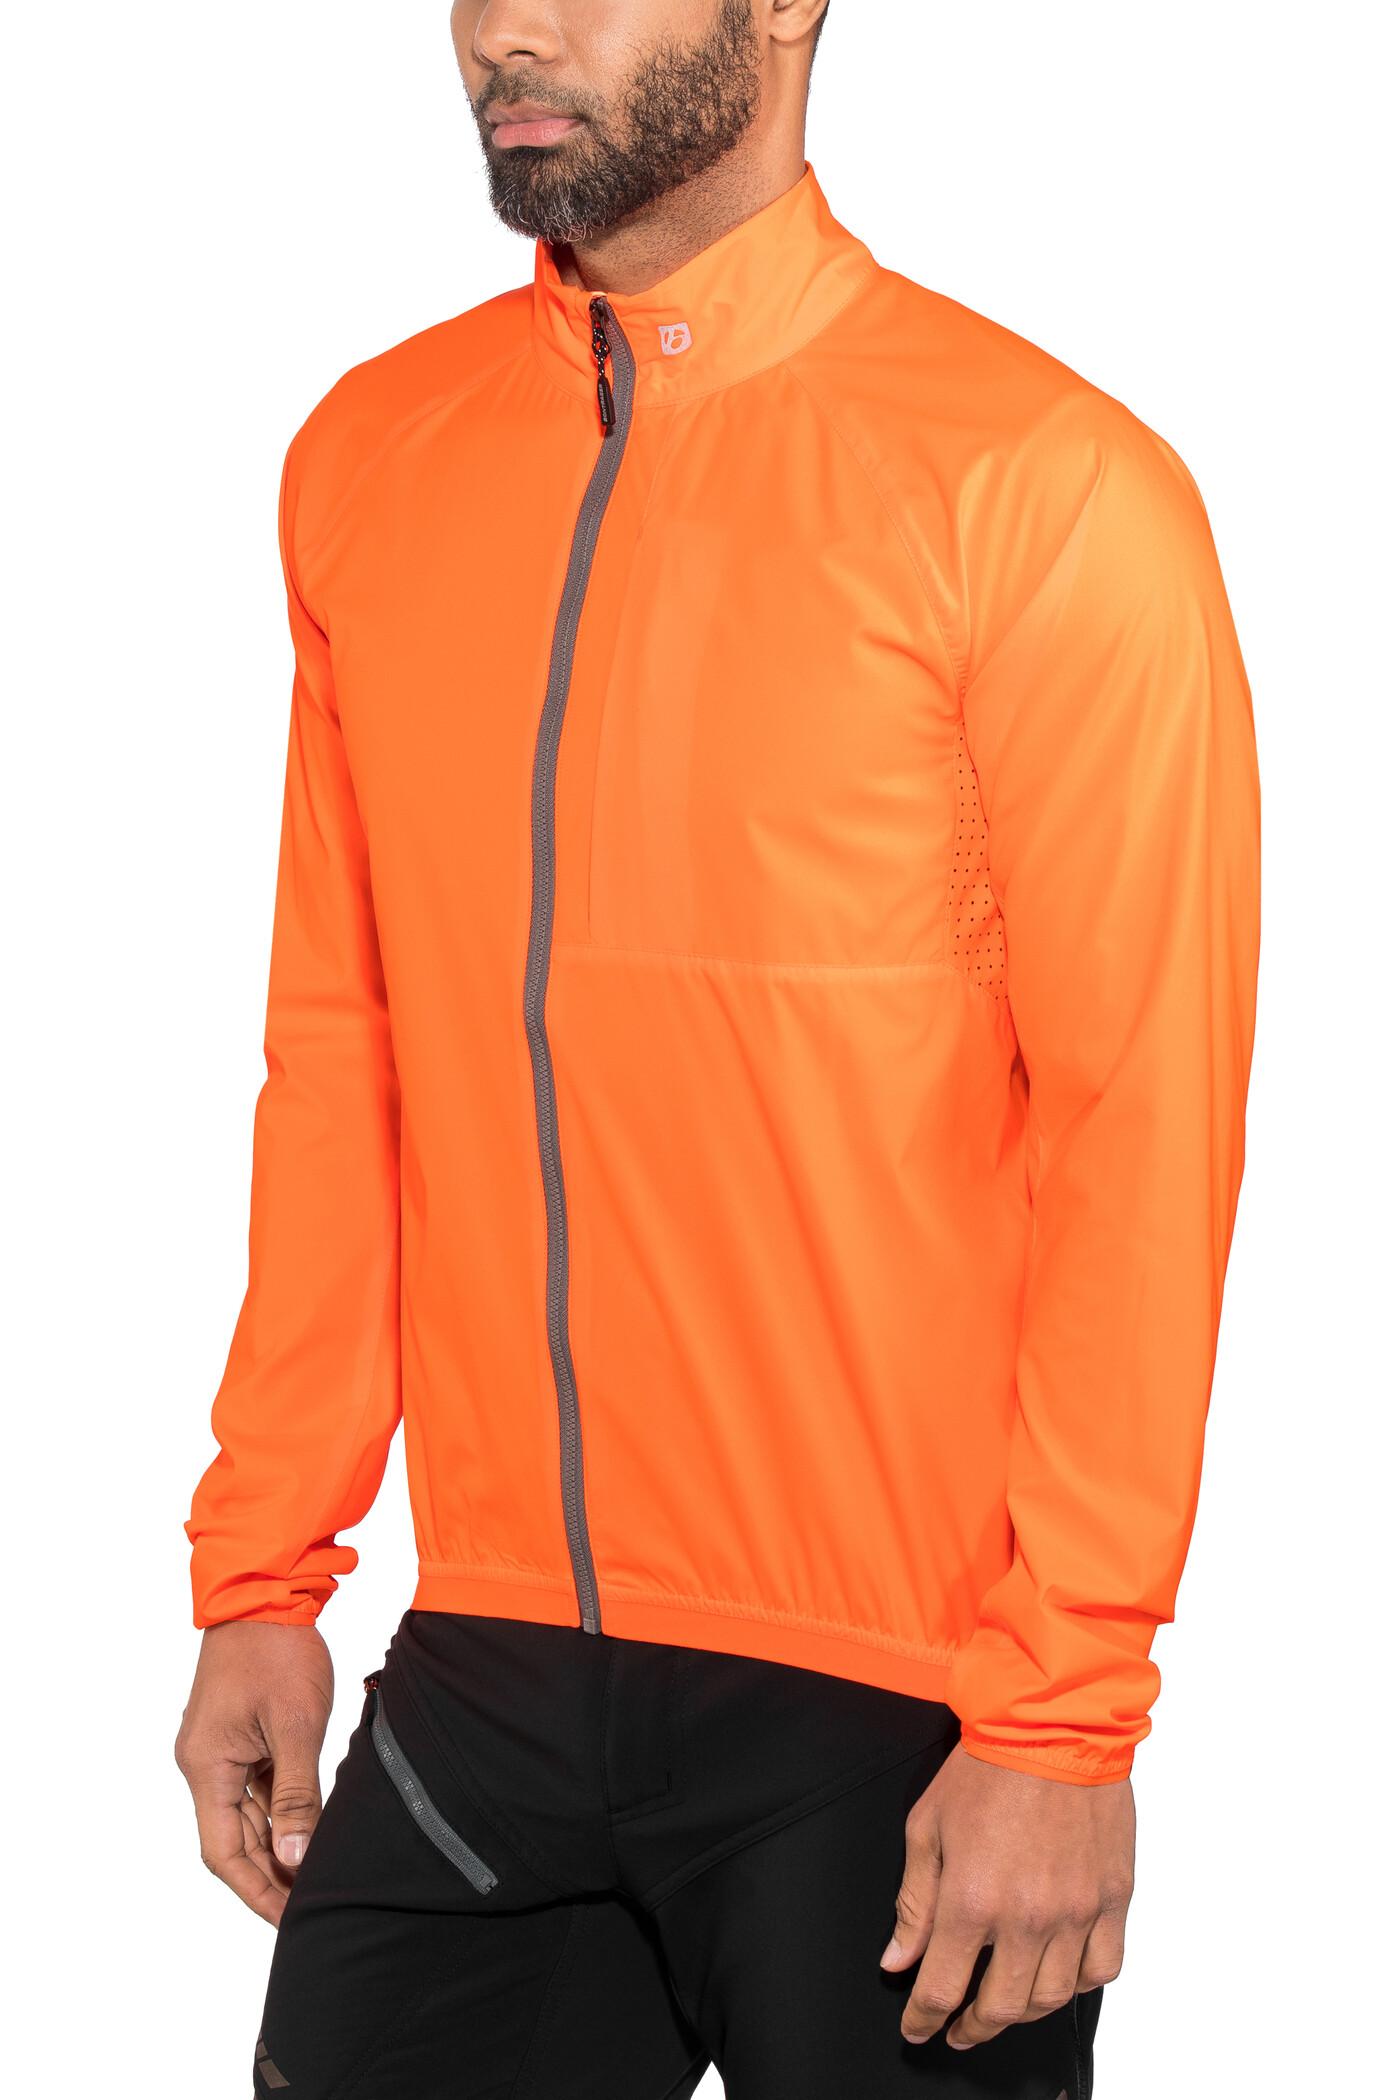 Bontrager Circuit Vindjakke Herrer, blaze orange (2019) | Jackets